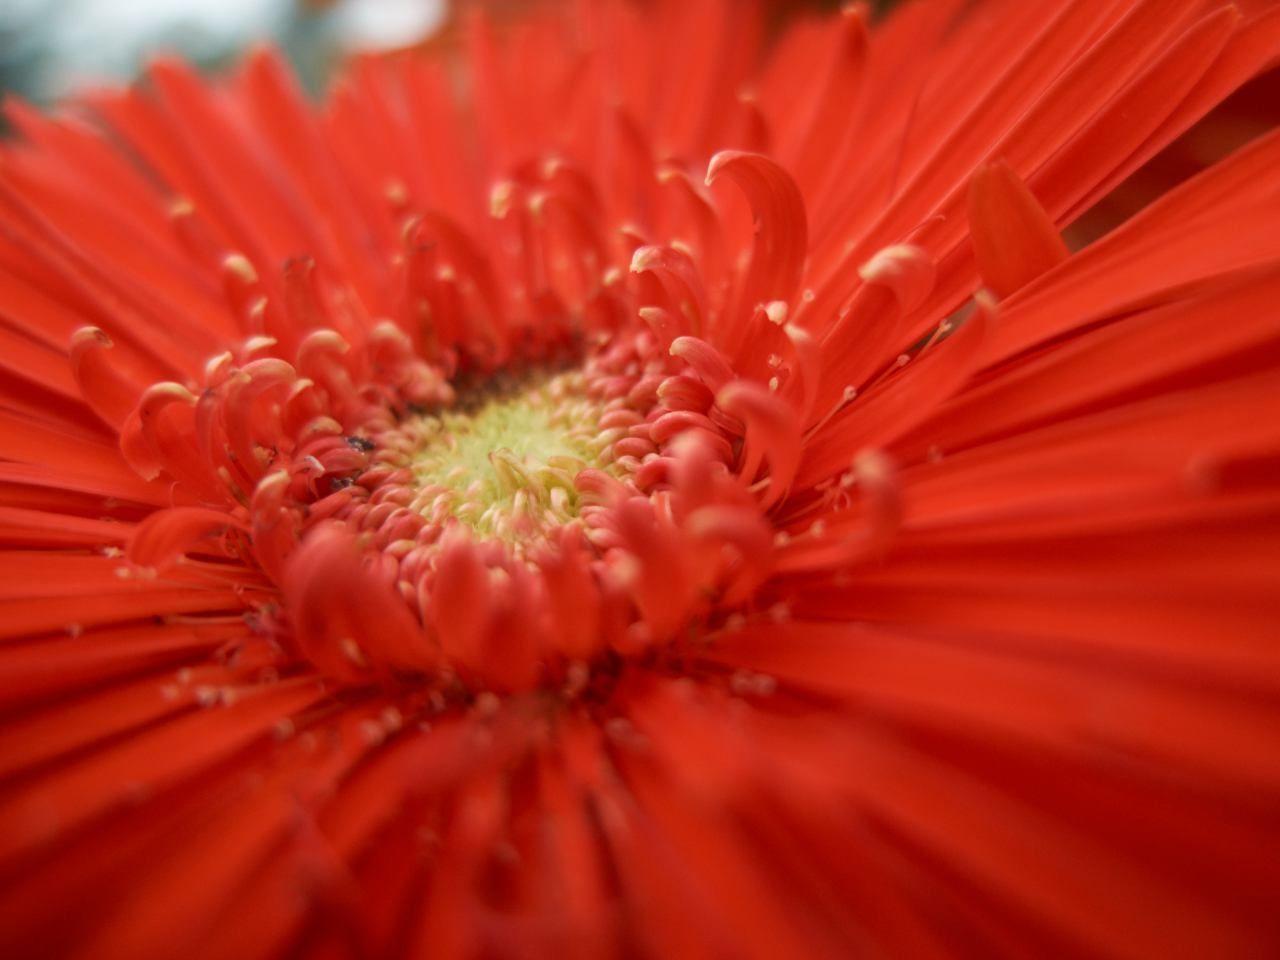 Red Flowerporn Flowers,Plants & Garden Flower Collection EyeEm Flower Eye4photography  EyeEm Nature Lover EyeEm Best Shots